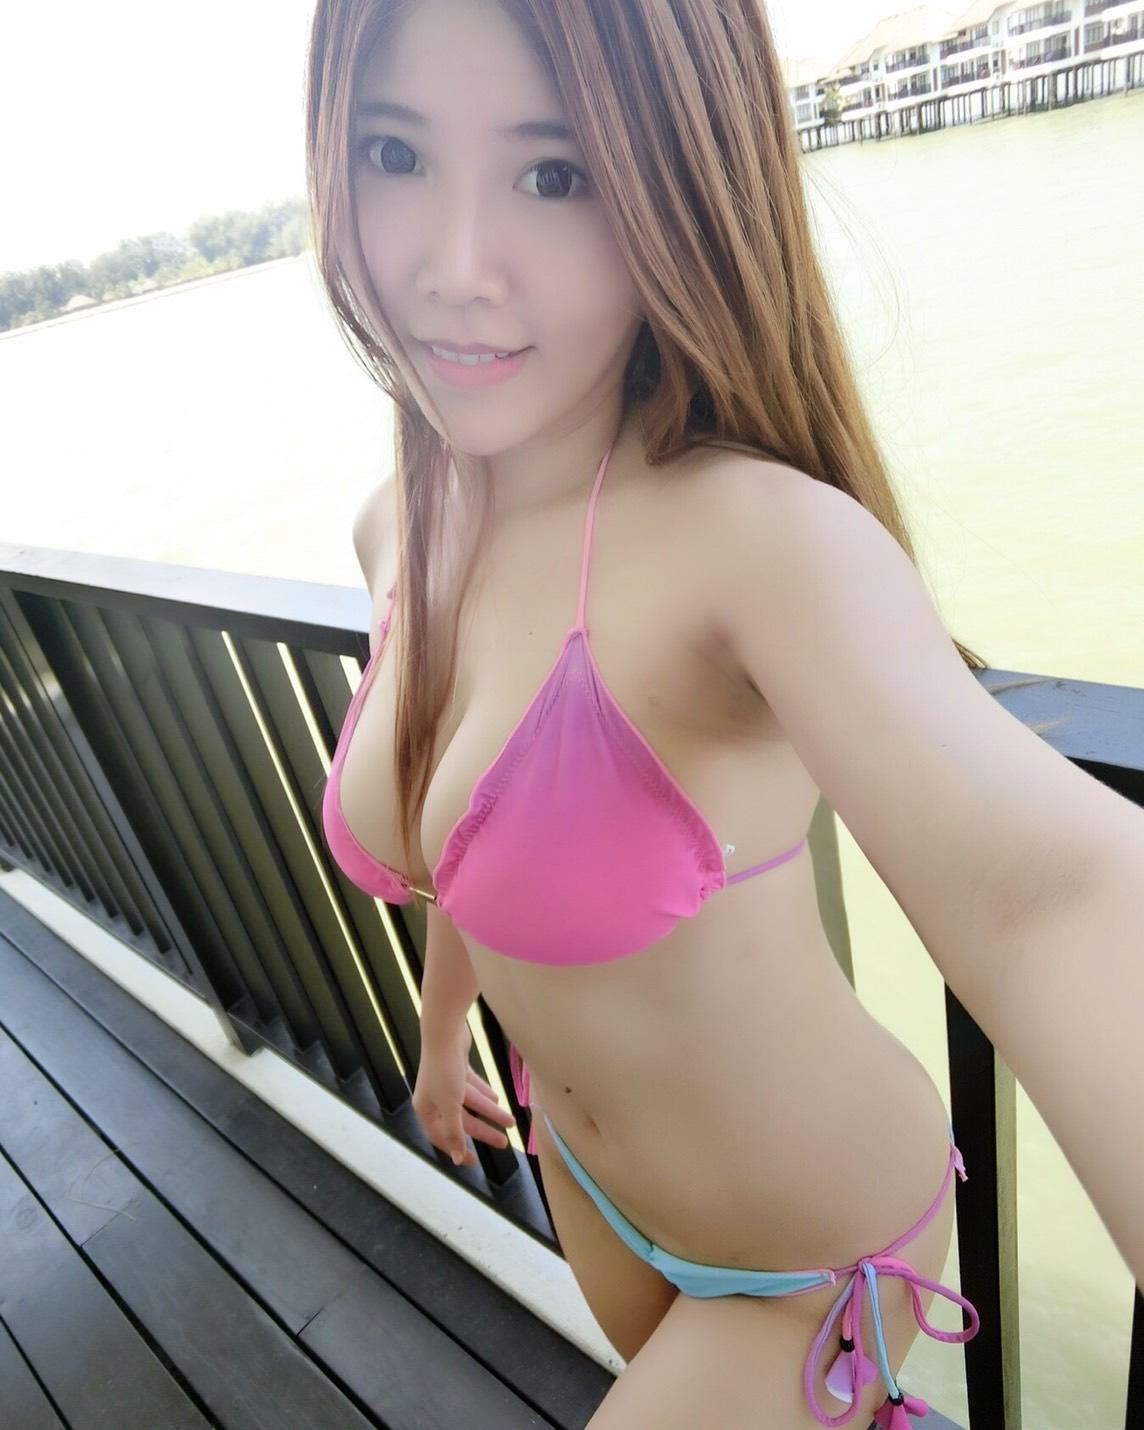 S__62087202